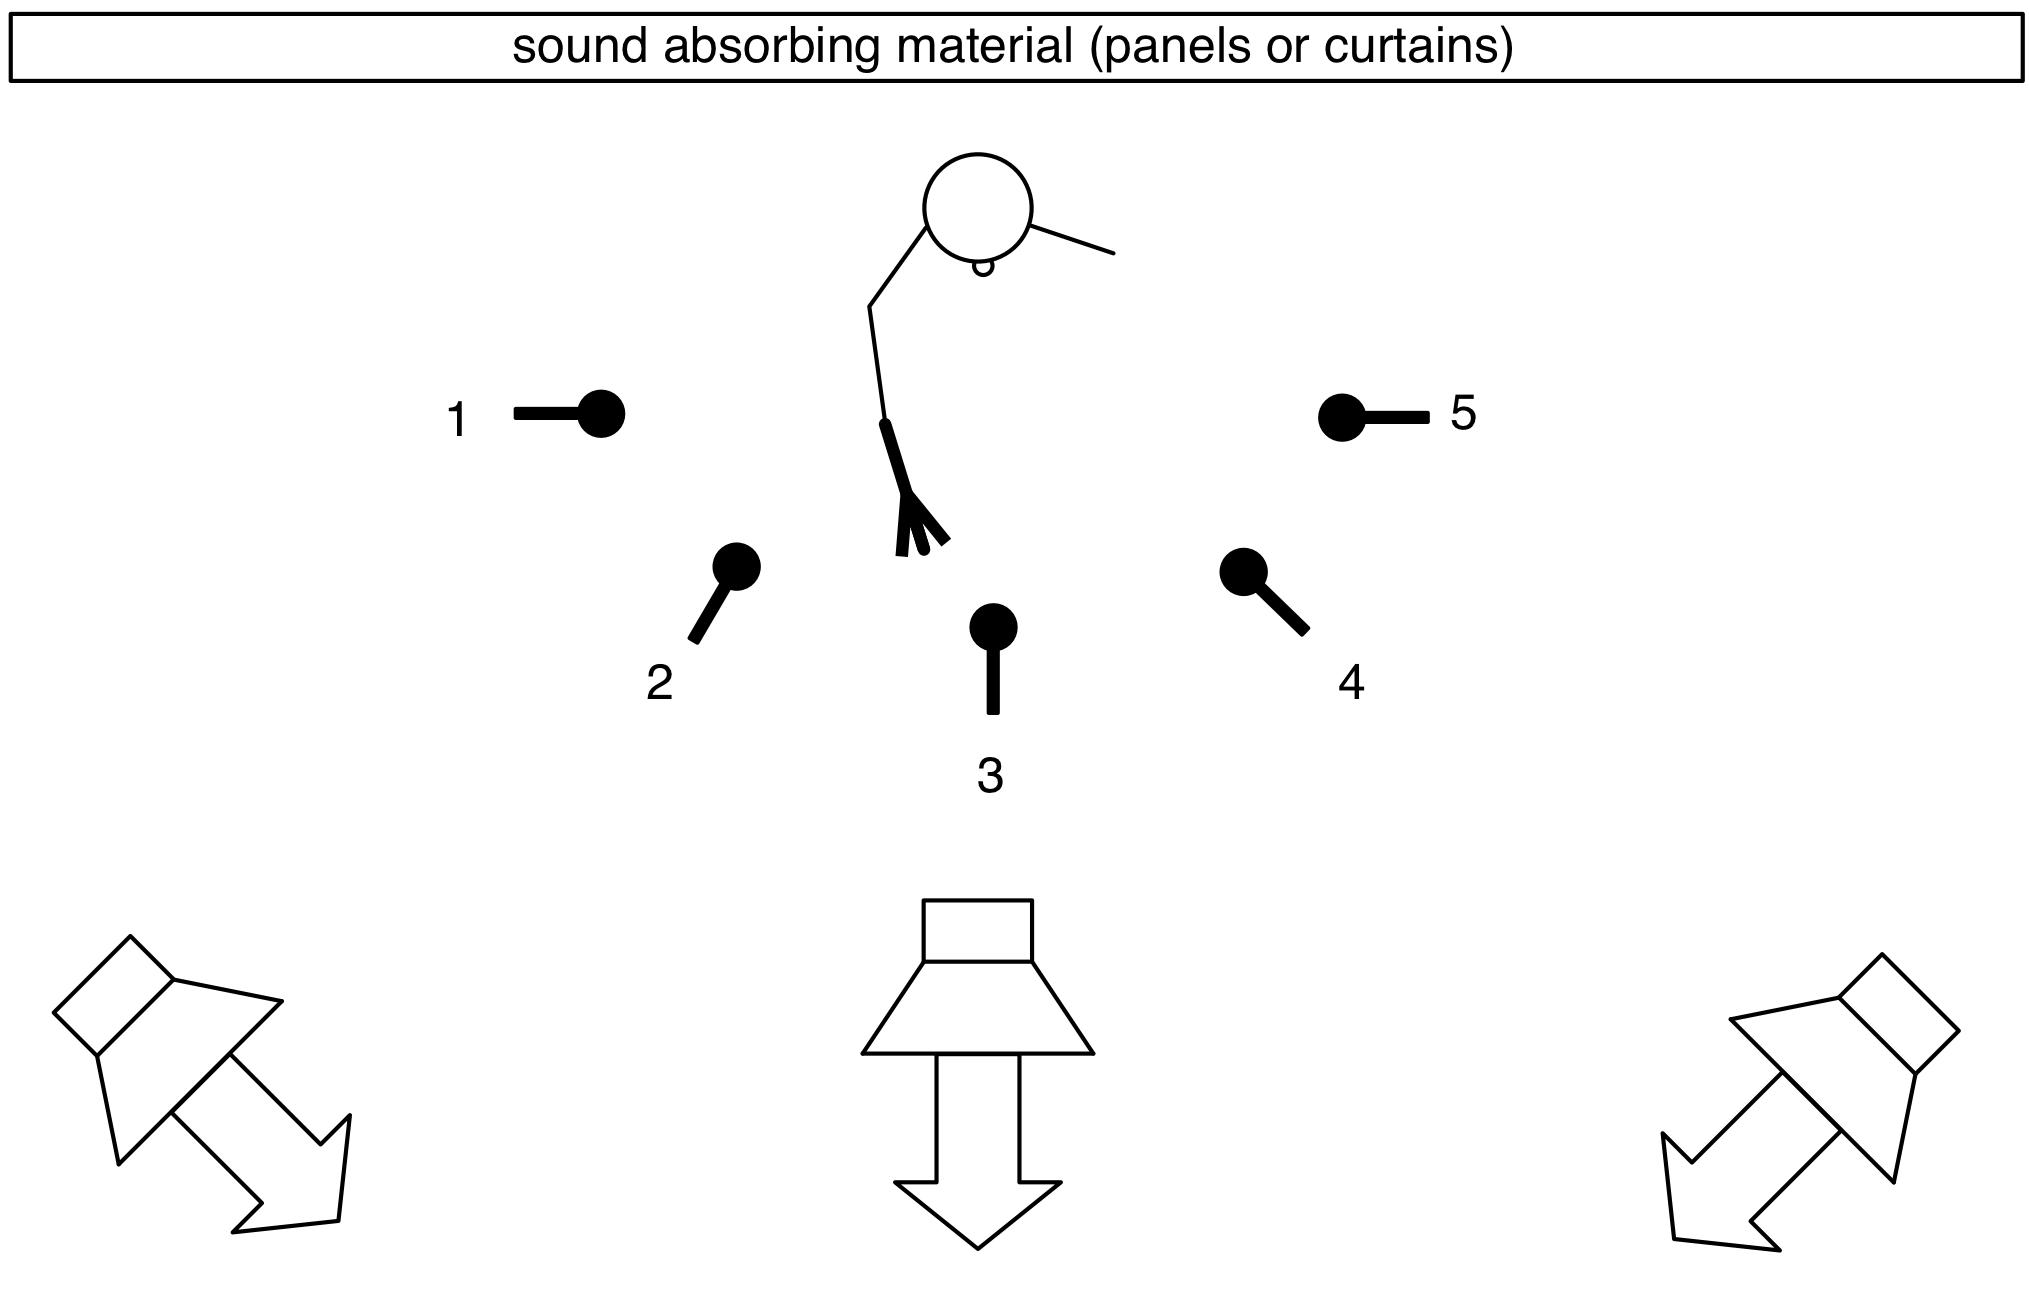 microphone loudspeaker set up scheme amplification